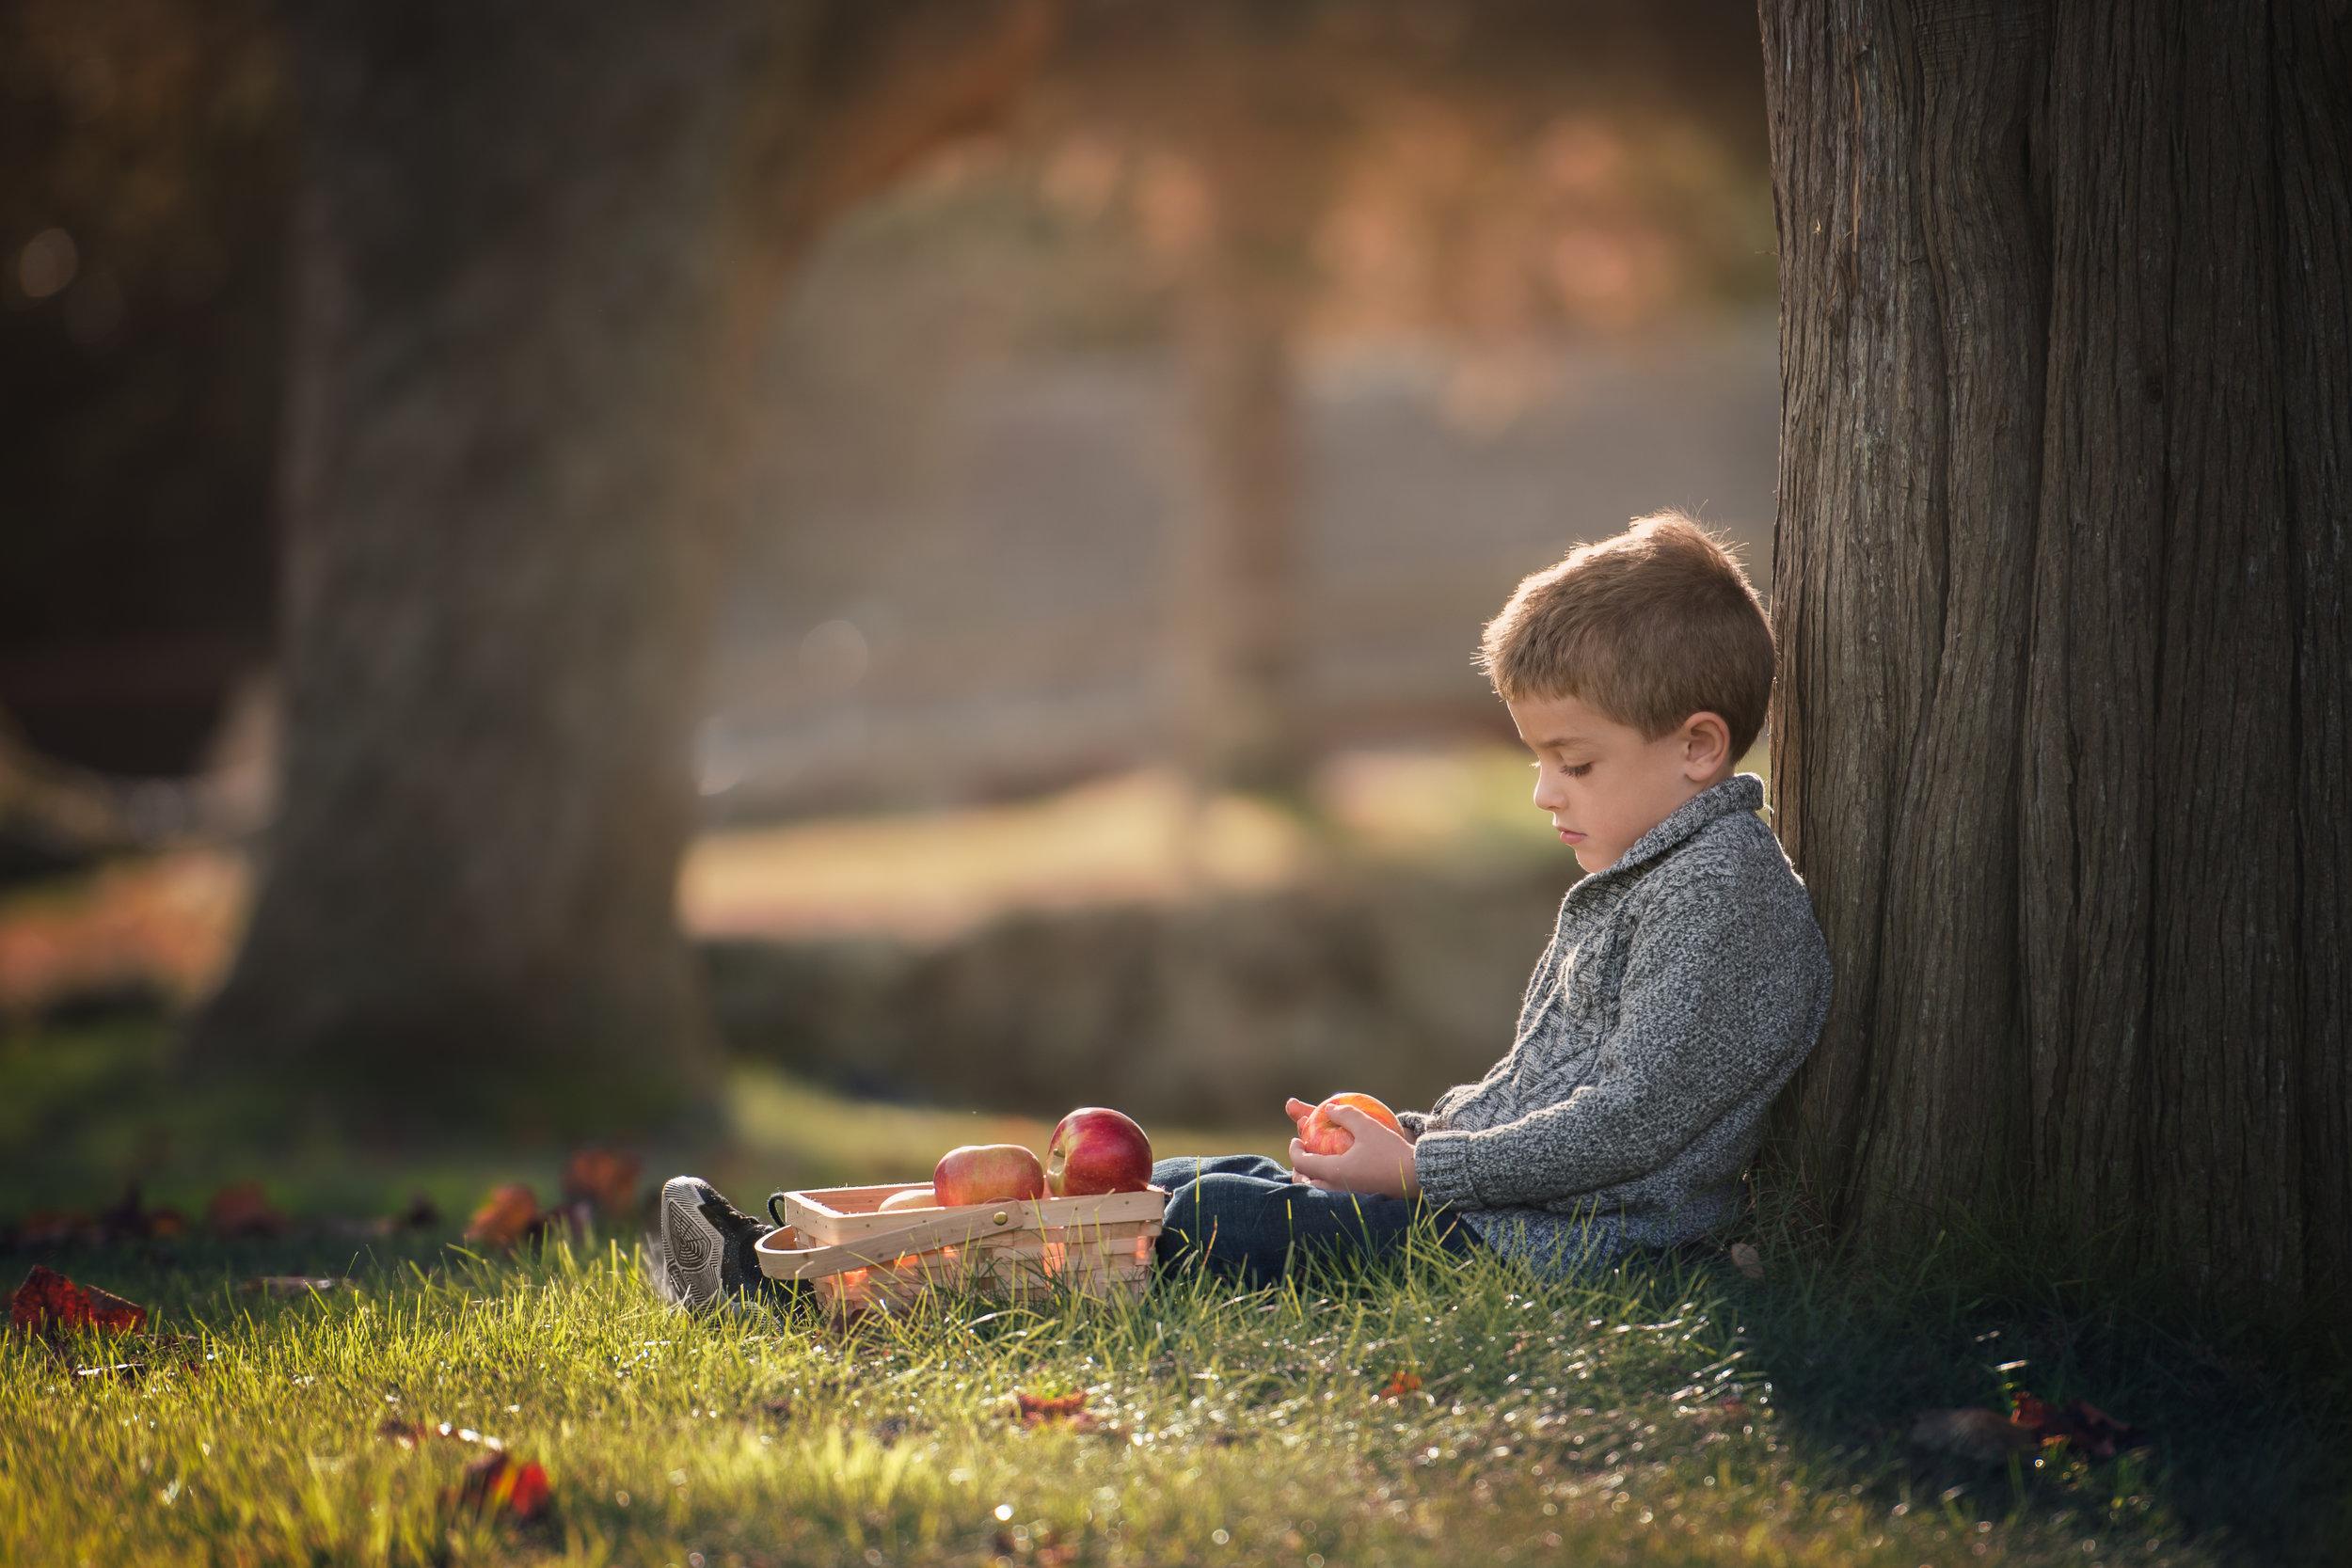 Award Winning Boy Holding Apple by a Tree